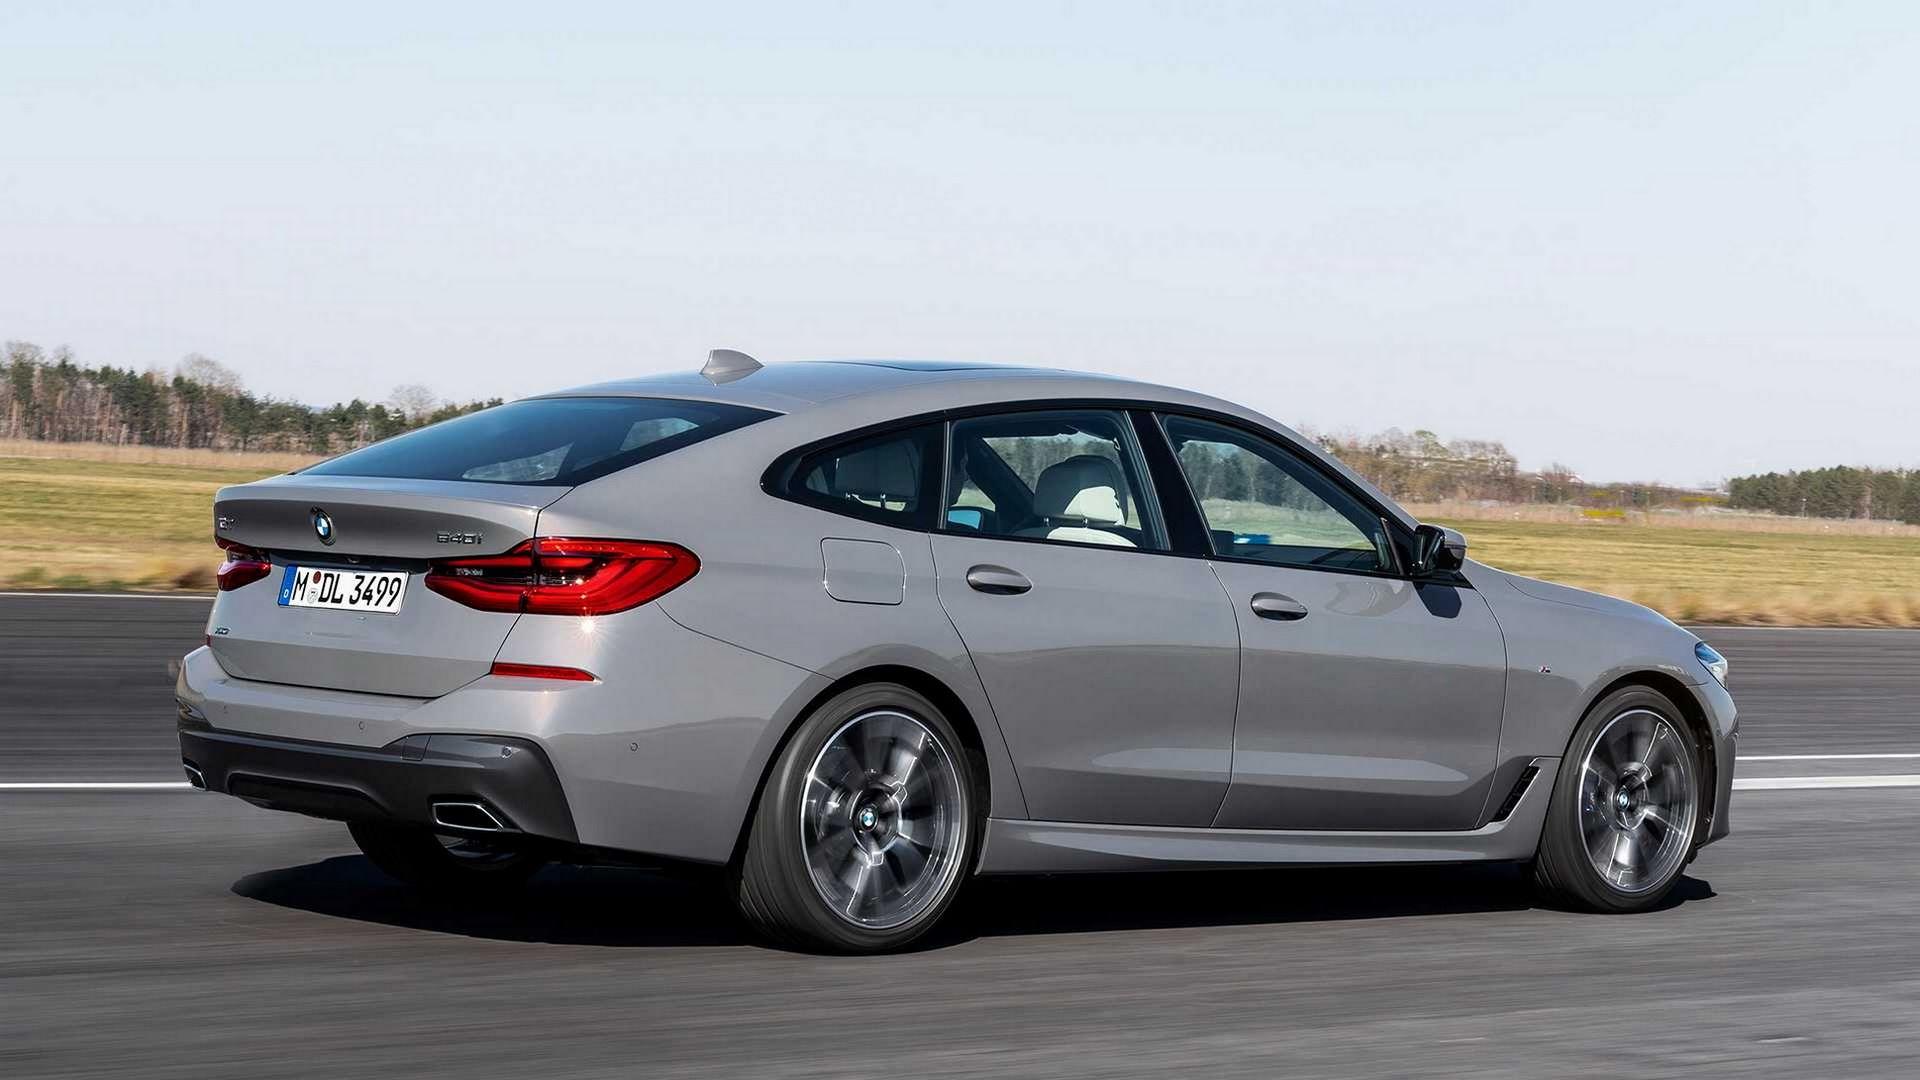 BMW-6-Series-GT-Gran-Turismo-facelift-2021-4